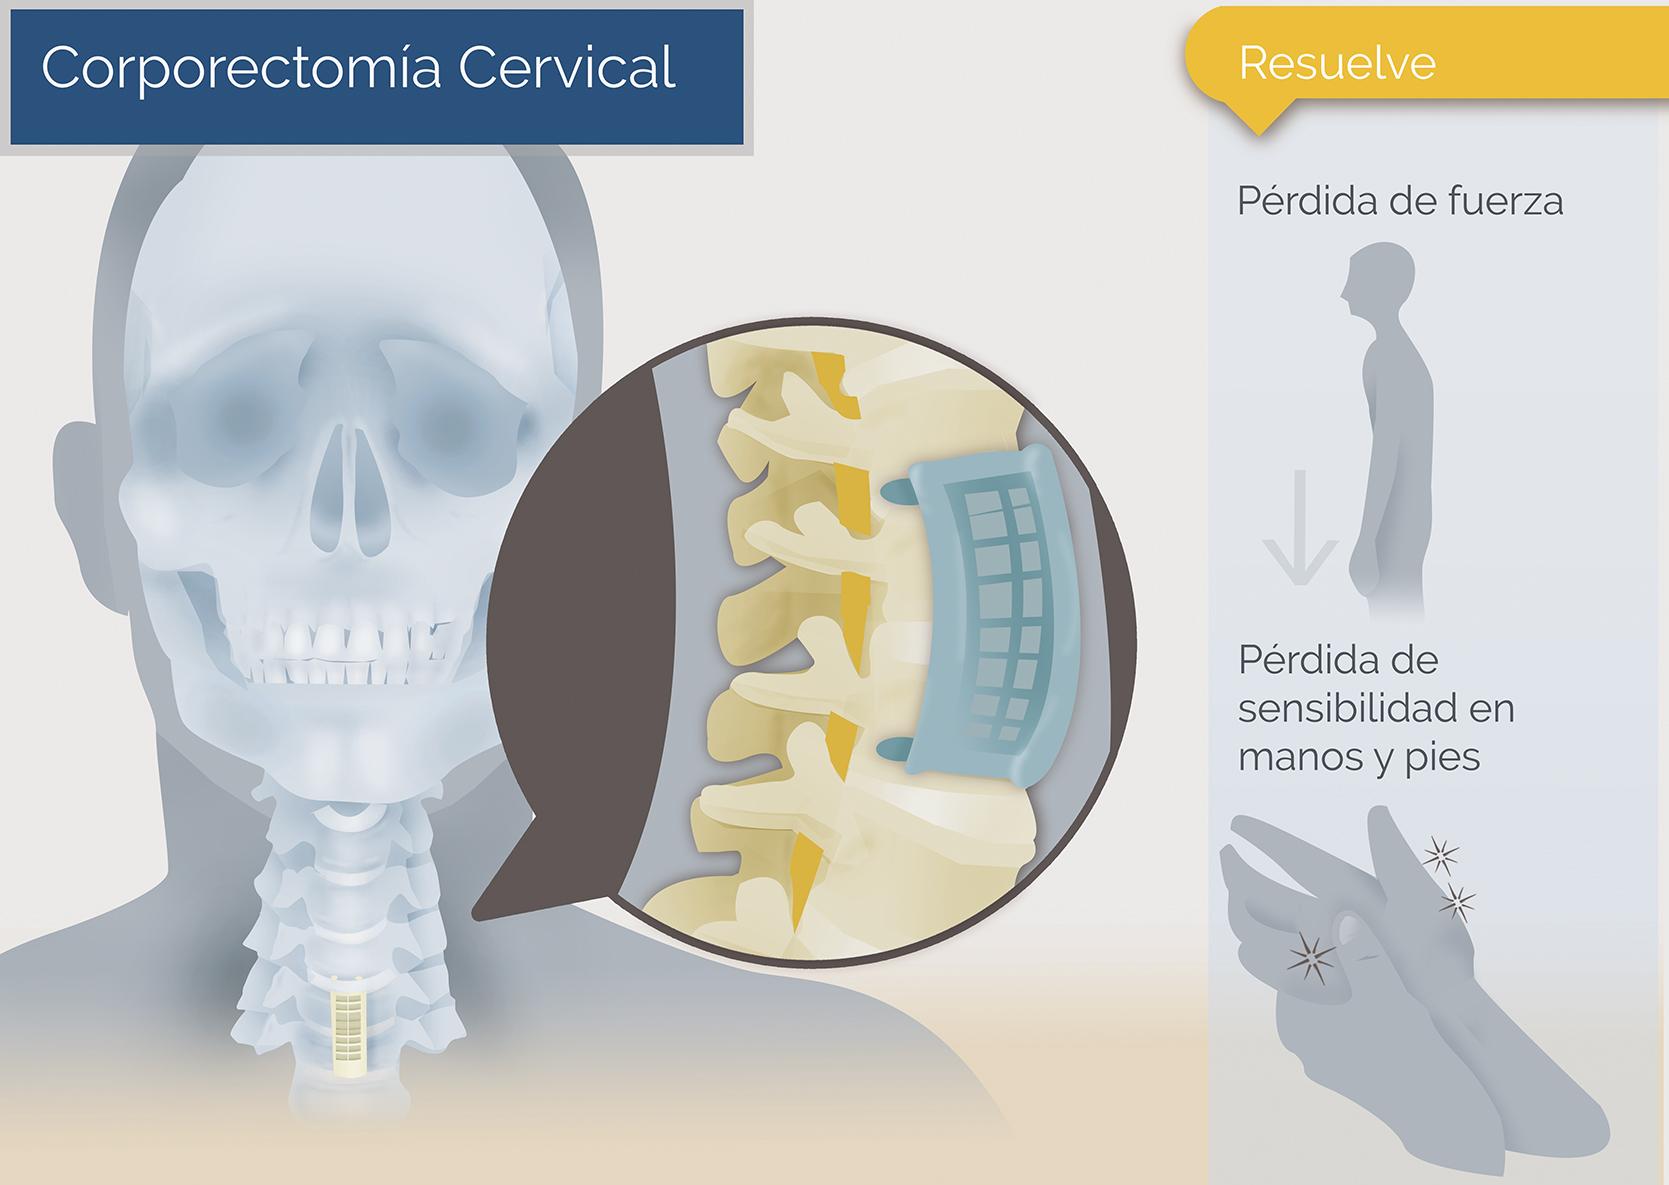 corporectomia cervical tratamiento